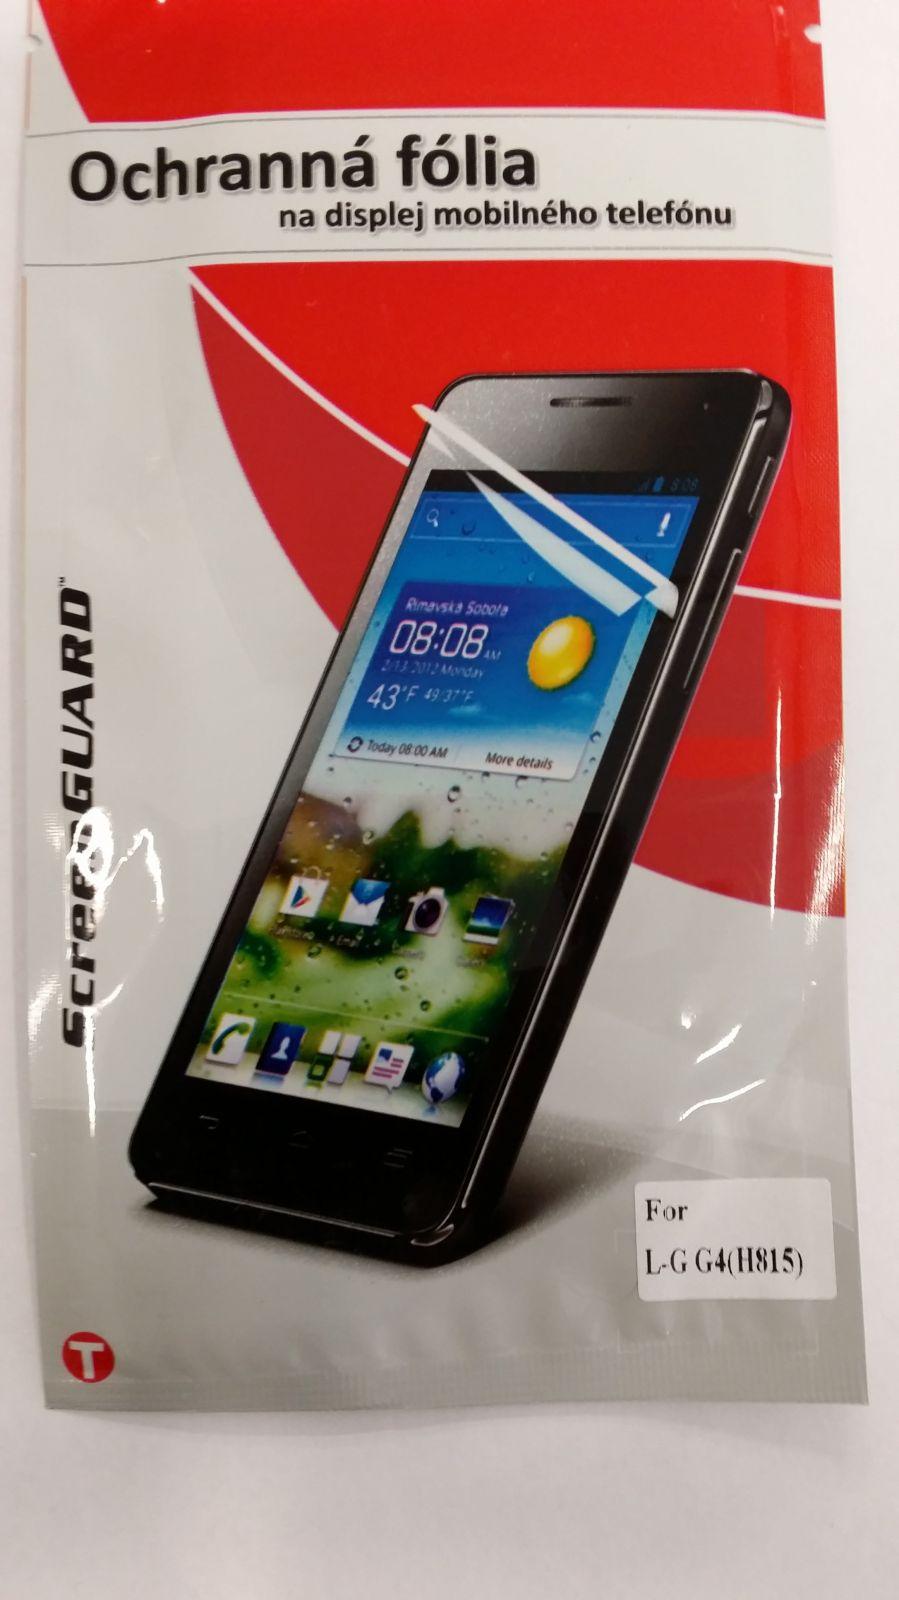 Ochranná folie Mobilnet LG G4/H815